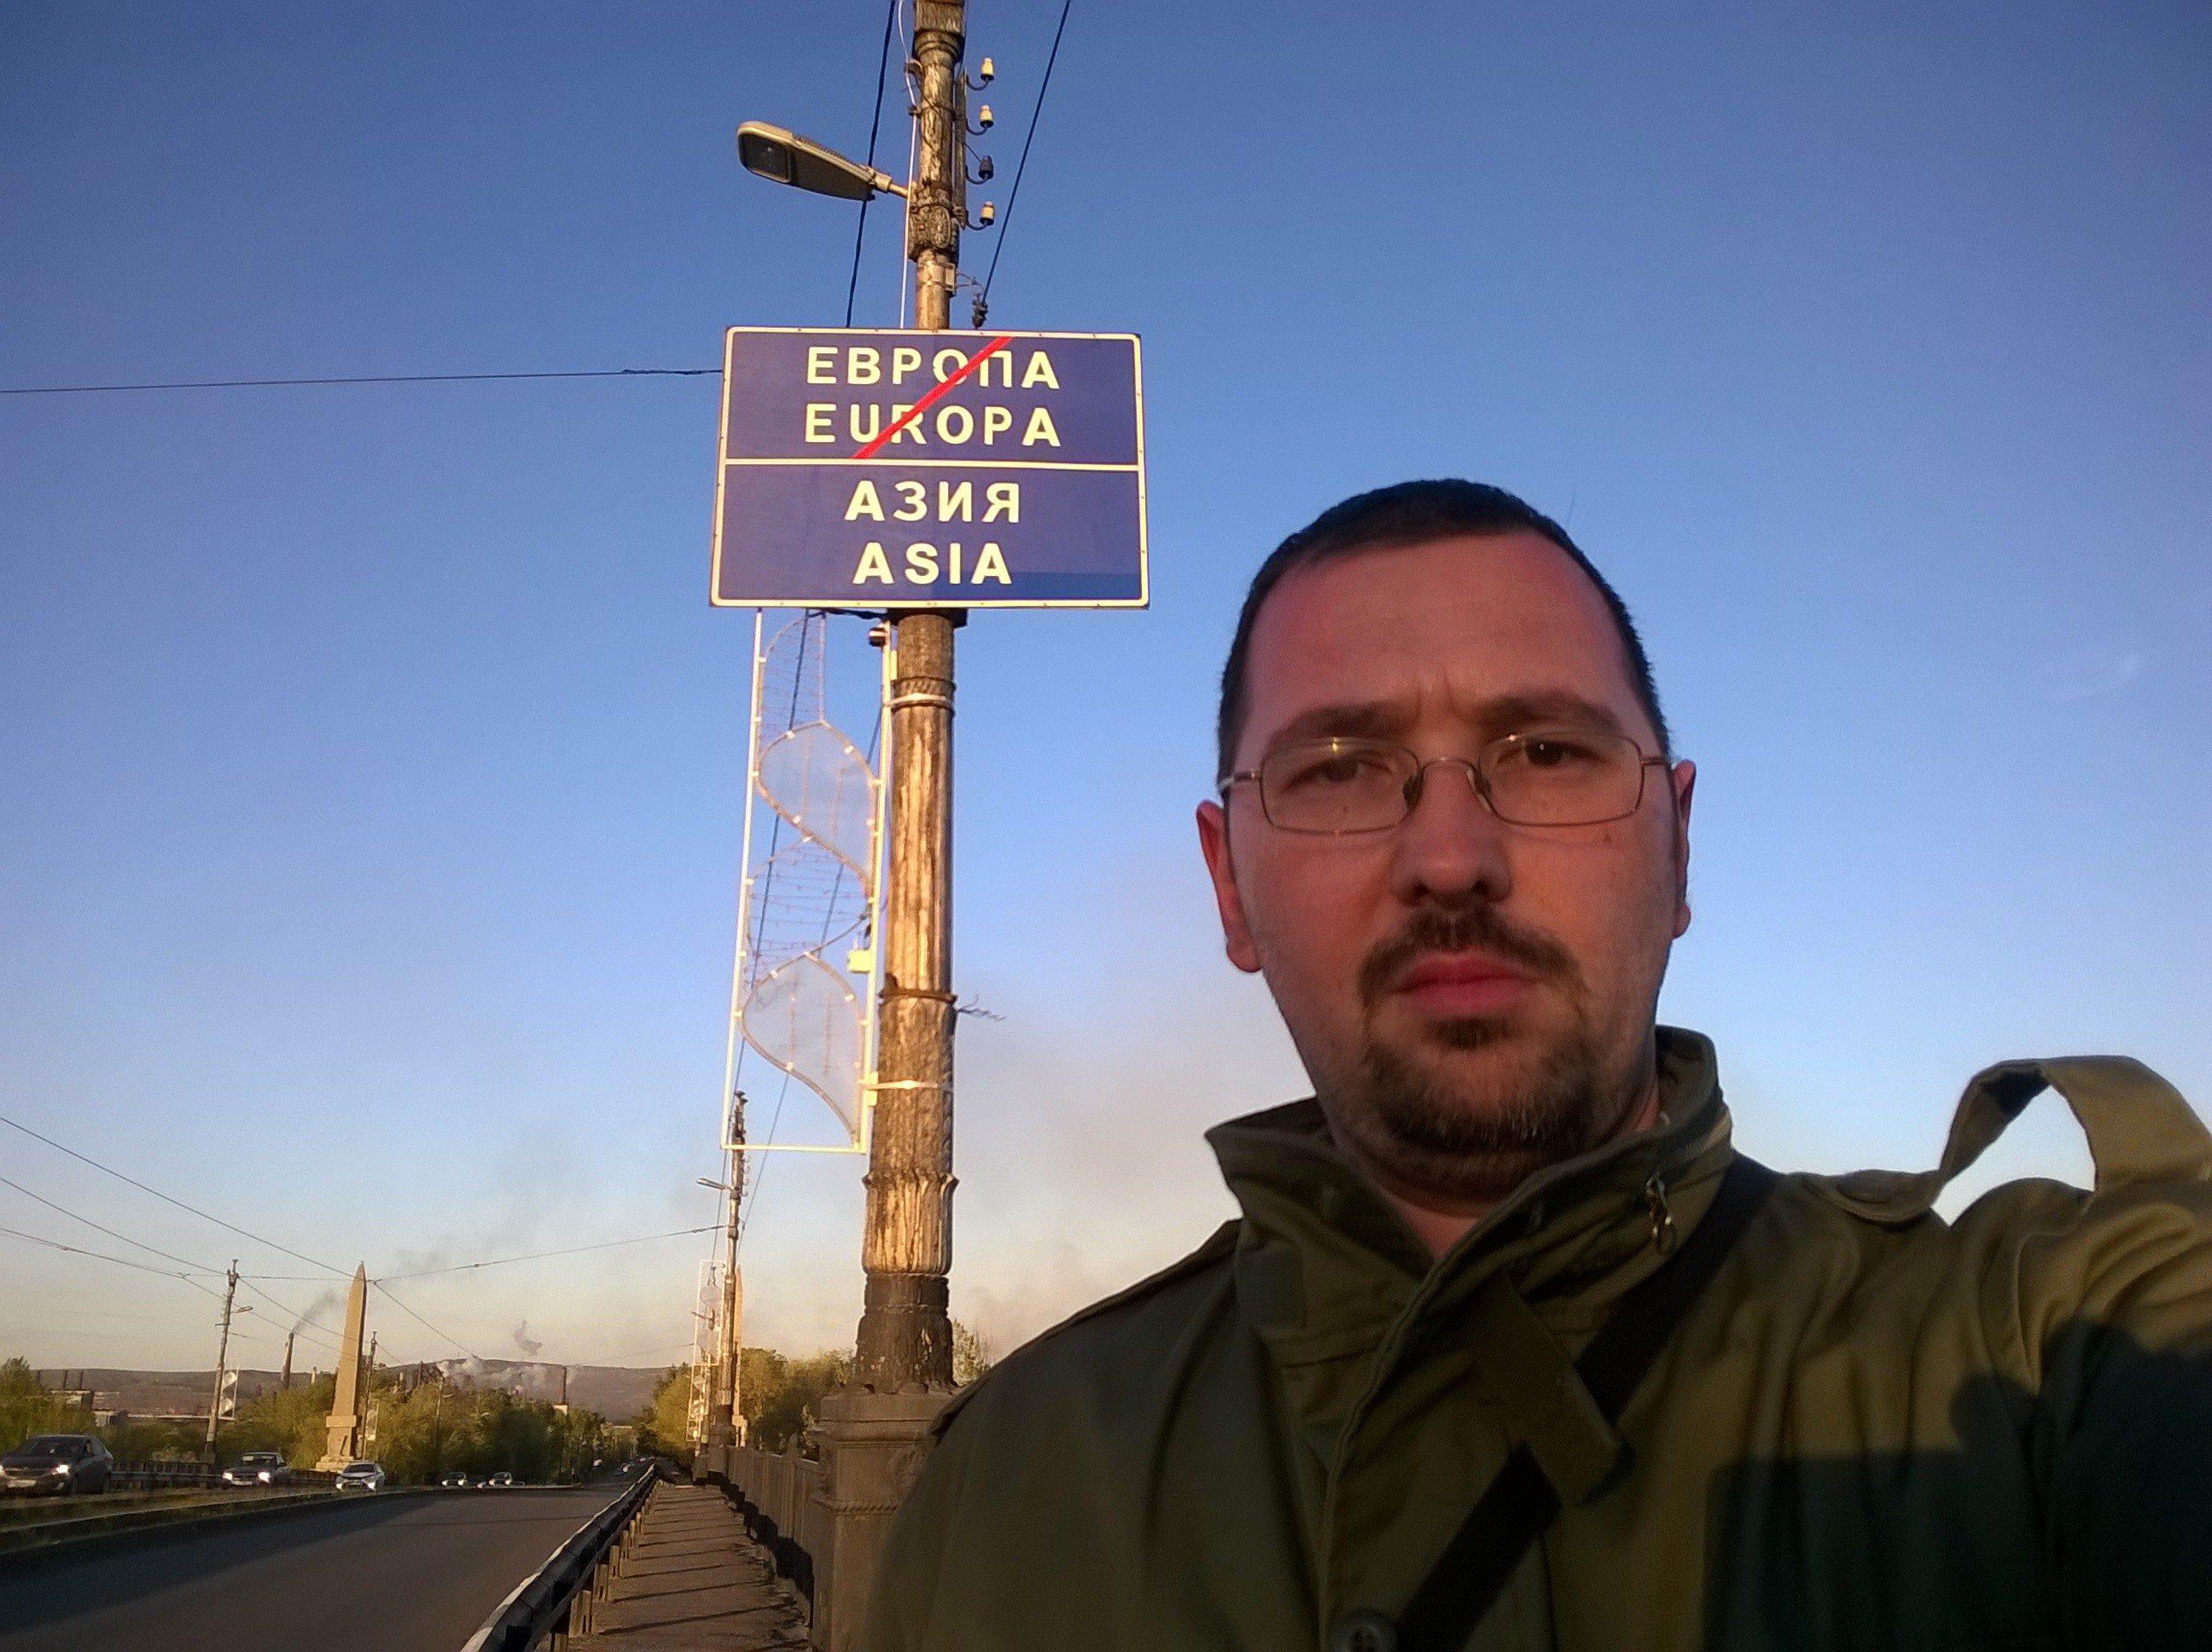 Selfie Evropa - Azia